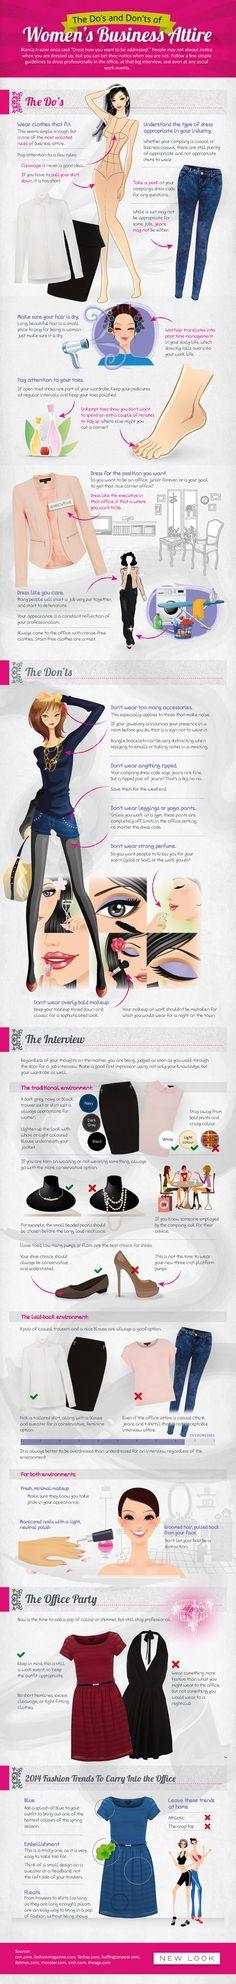 Women's Business Attire - Fashion Infographic - dress - women